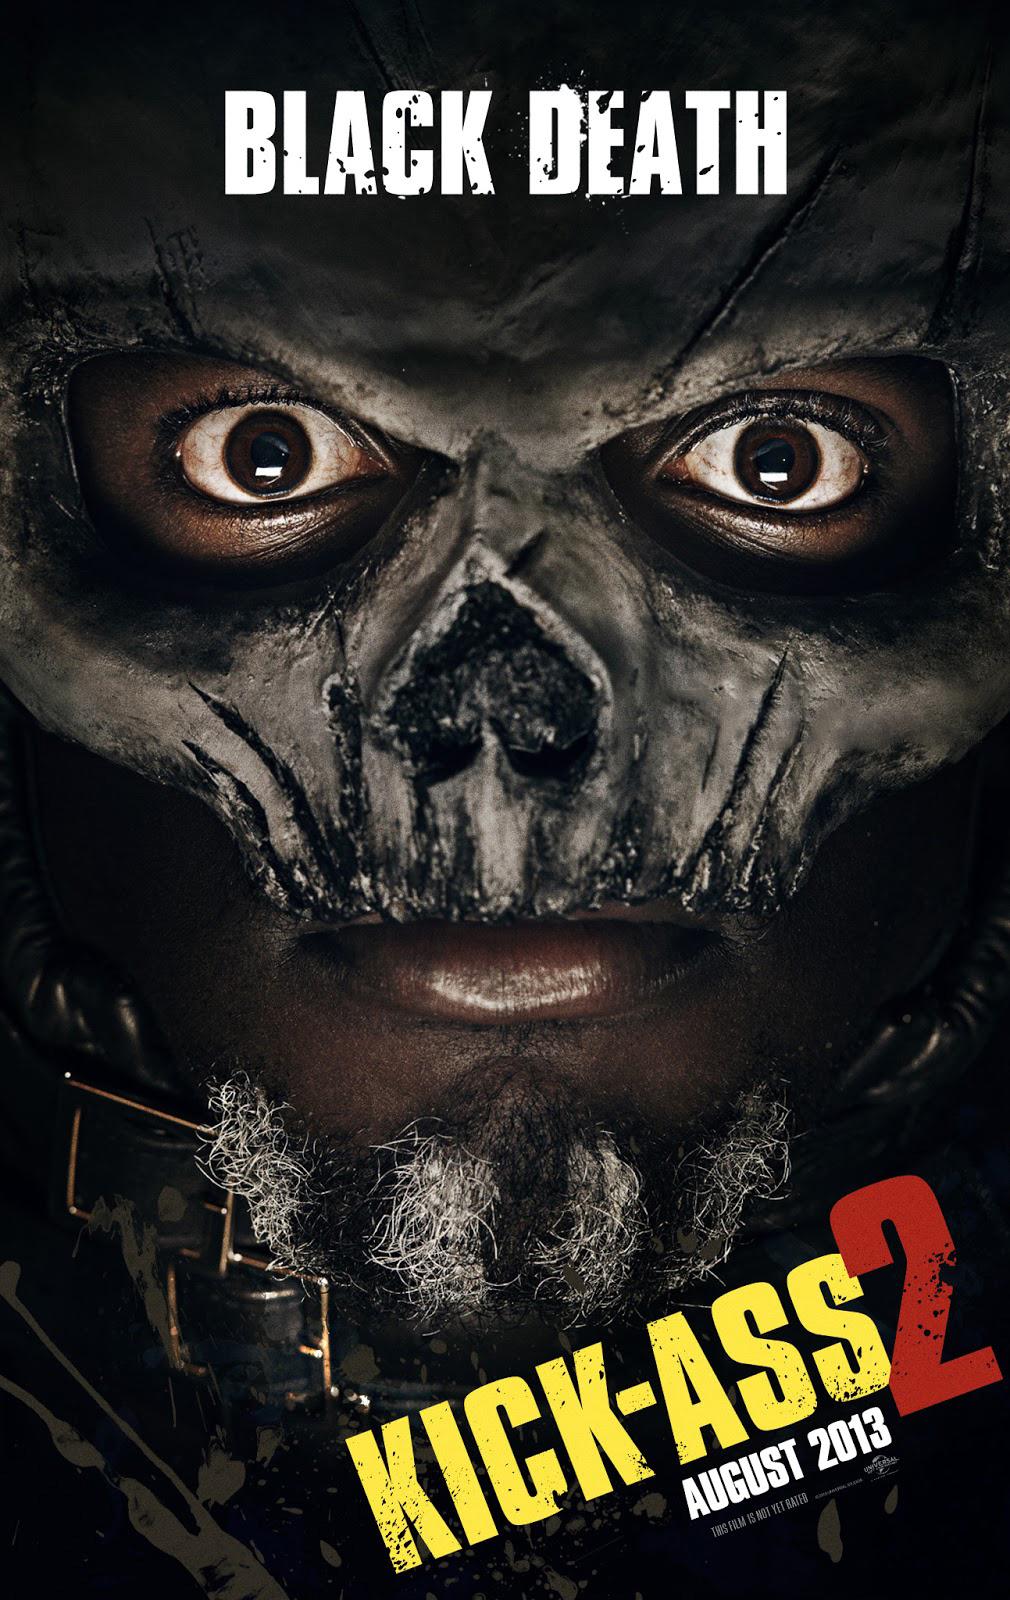 Kick-Ass 2 - Movie Poster #3 (Original)